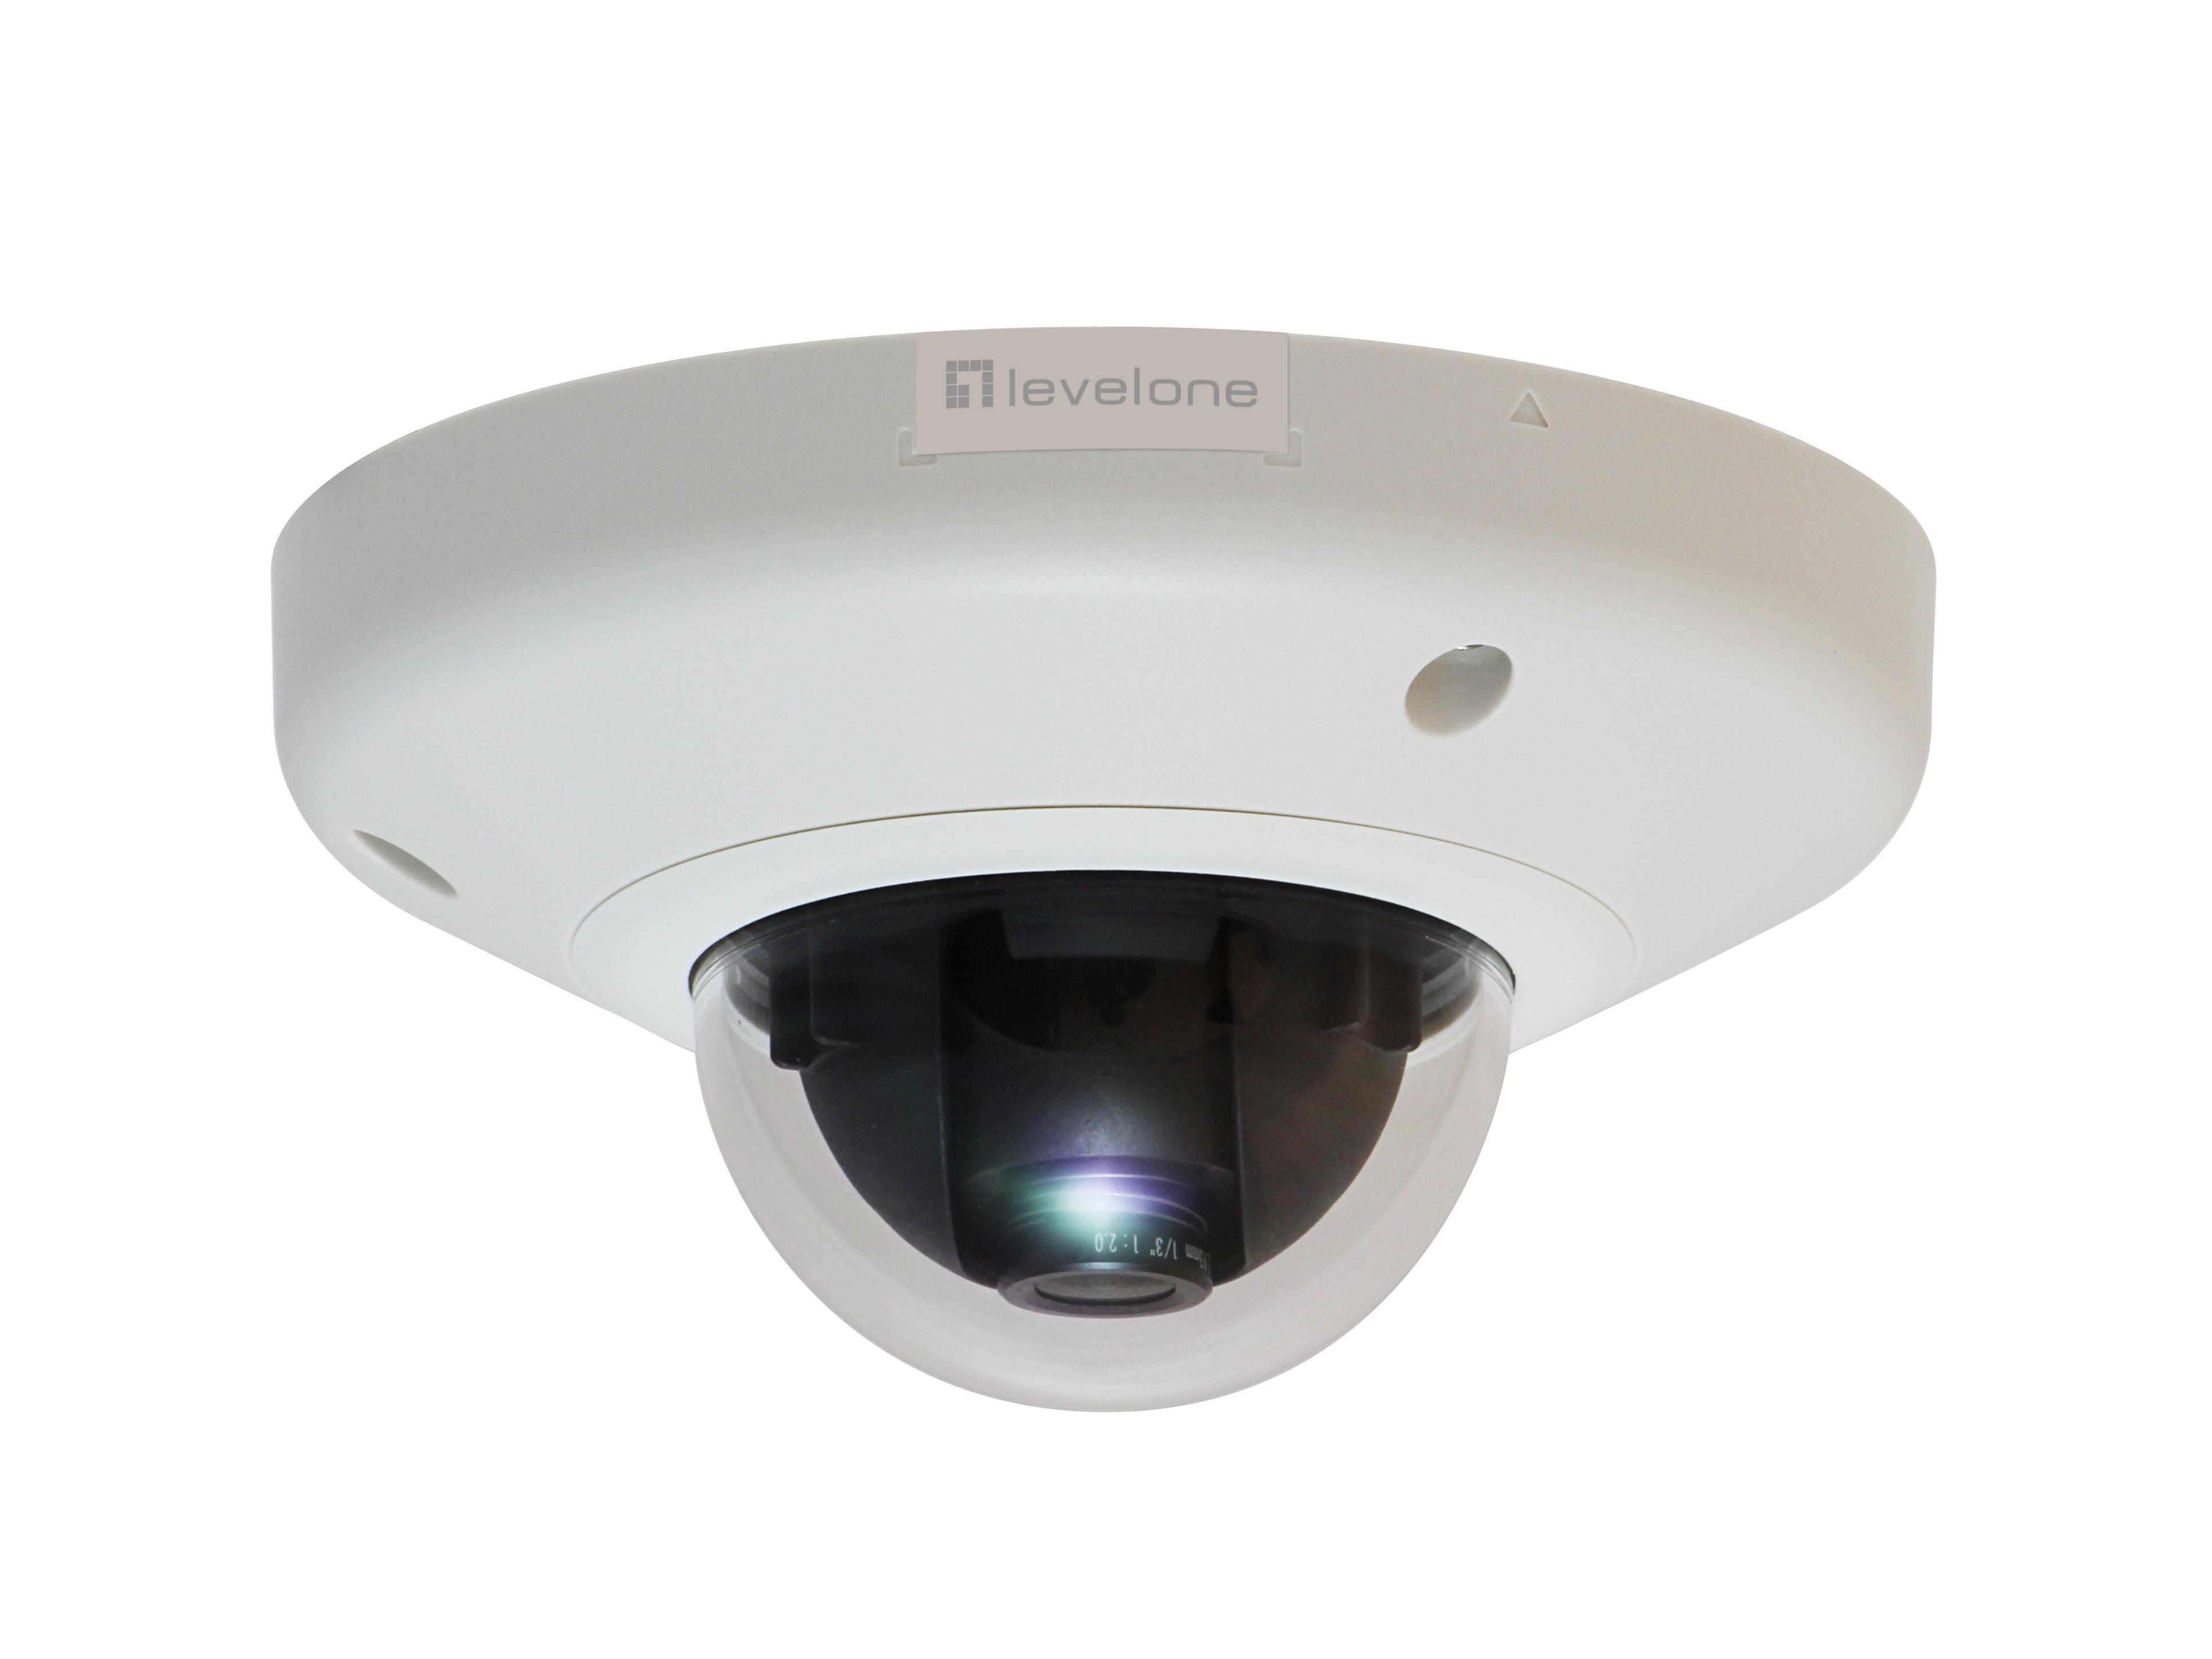 LevelOne Fixed Dome Network Camera - 3-Megapixel - PoE 802.3af - IP-Sicherheitskamera - Verkabelt - CE - FCC - IK08 - Kuppel - Decke/Wand - Schwarz - Weiß